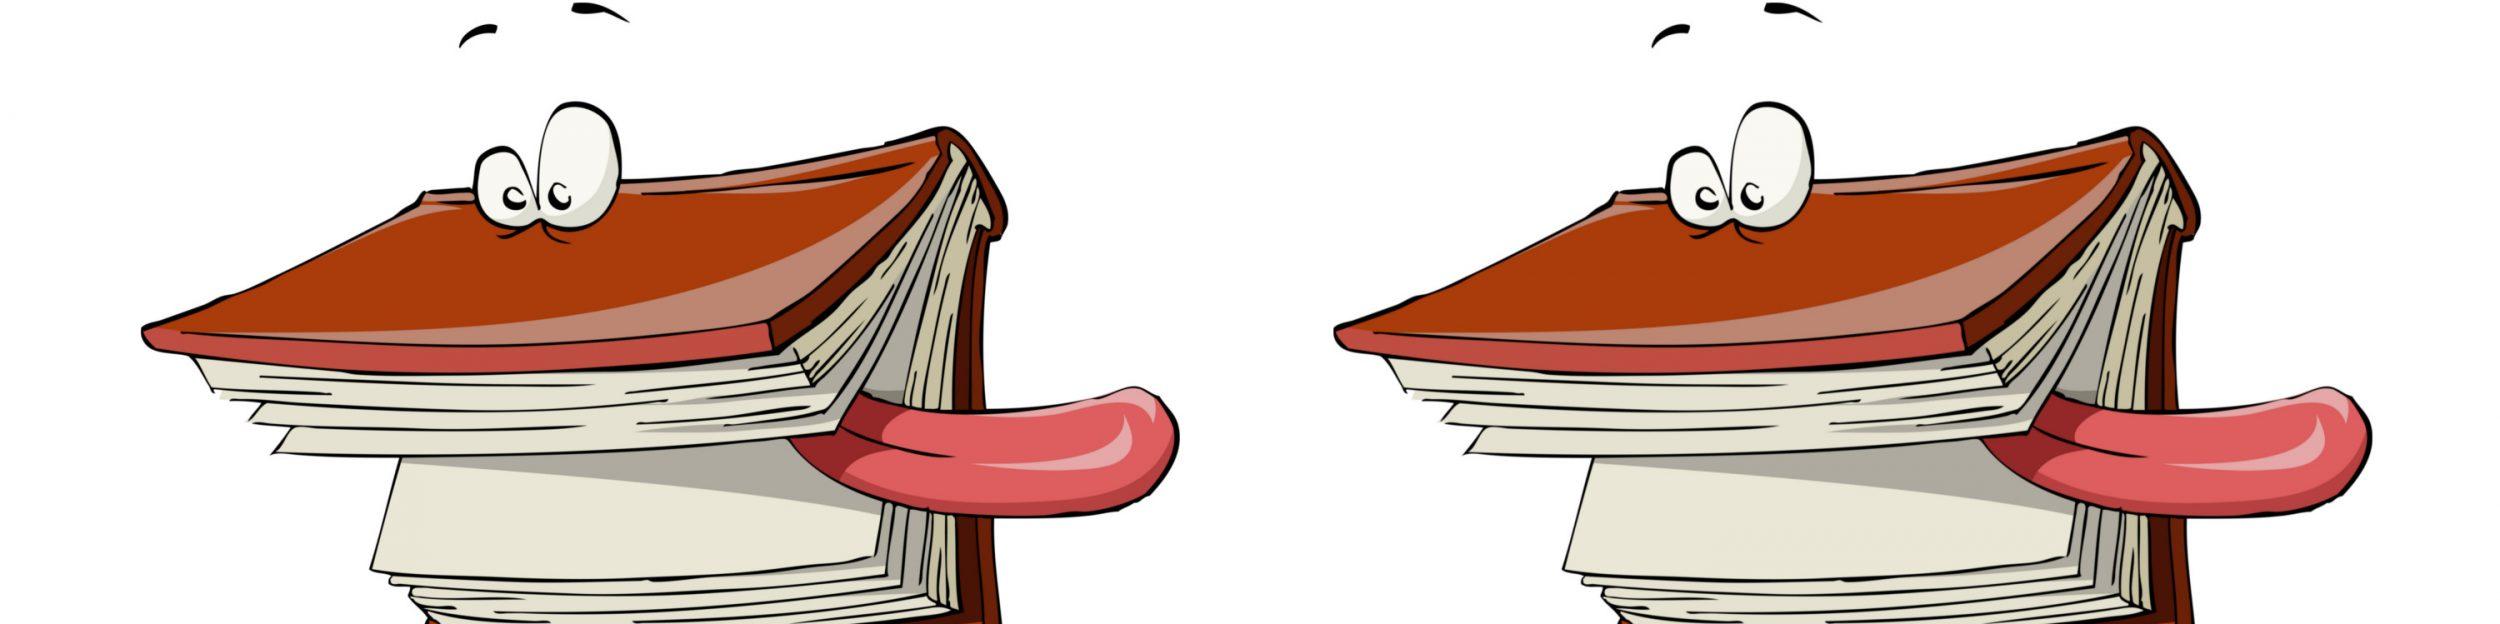 Verrückte Bücher